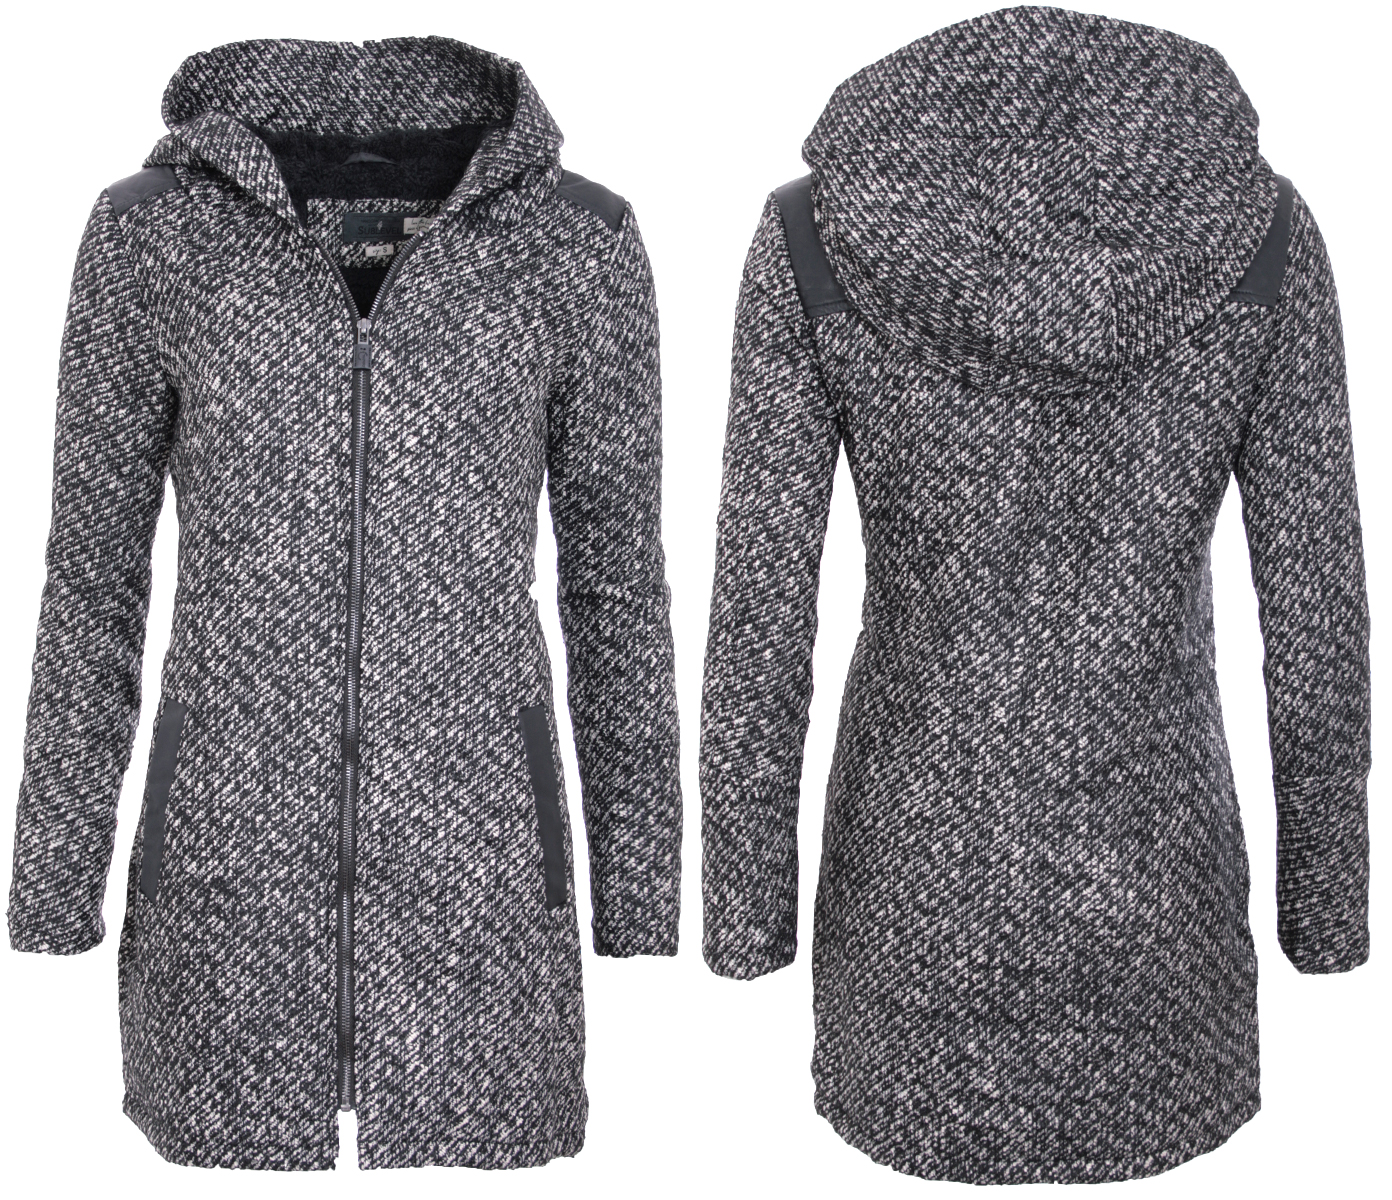 sublevel damen winter jacke woll jacke parka winter mantel. Black Bedroom Furniture Sets. Home Design Ideas